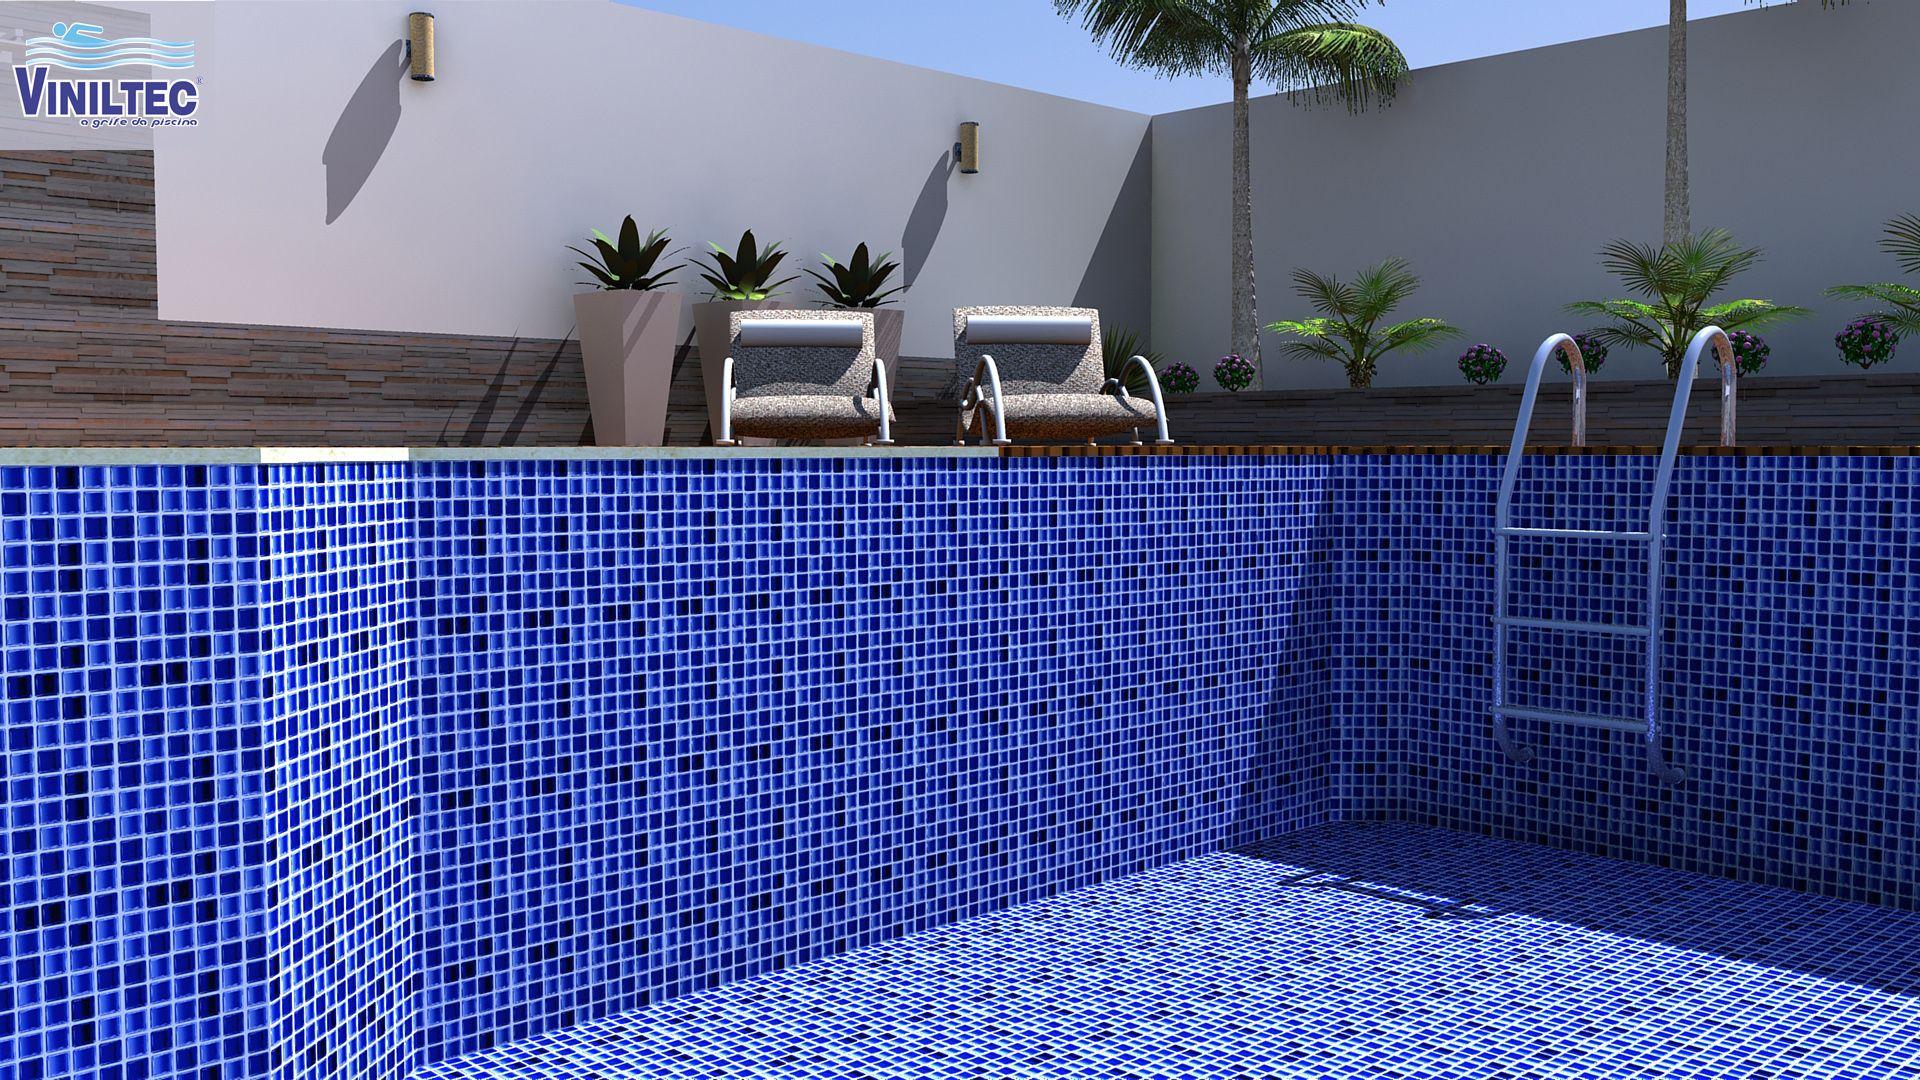 Estampas de vinil sansuy viniltec piscinas de vinil for Piscina fum d estampa